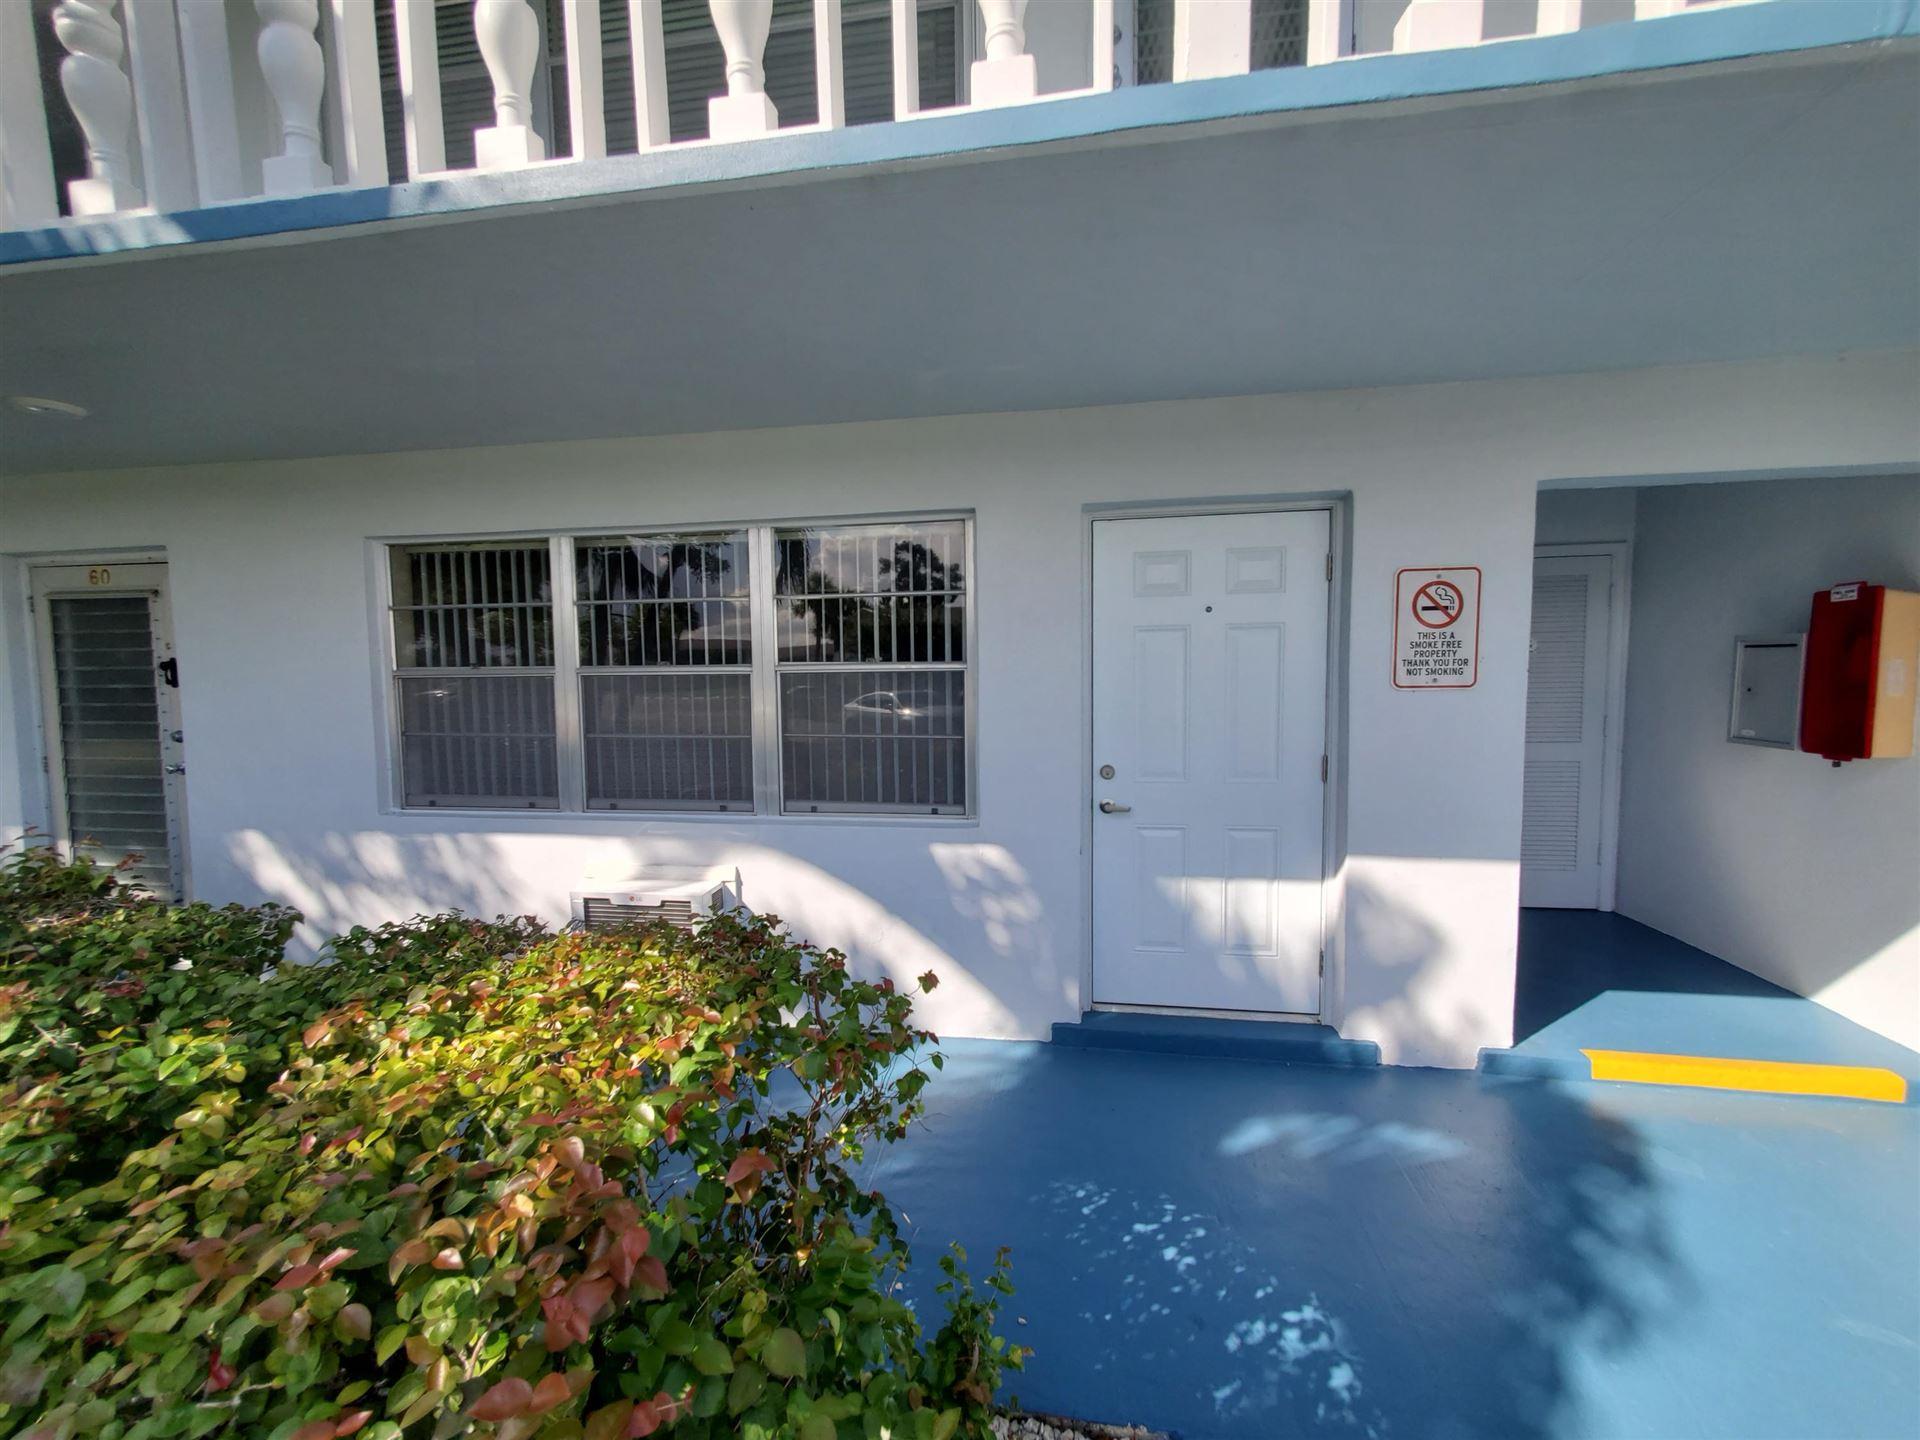 59 Berkshire C #59c, West Palm Beach, FL 33417 - #: RX-10633606